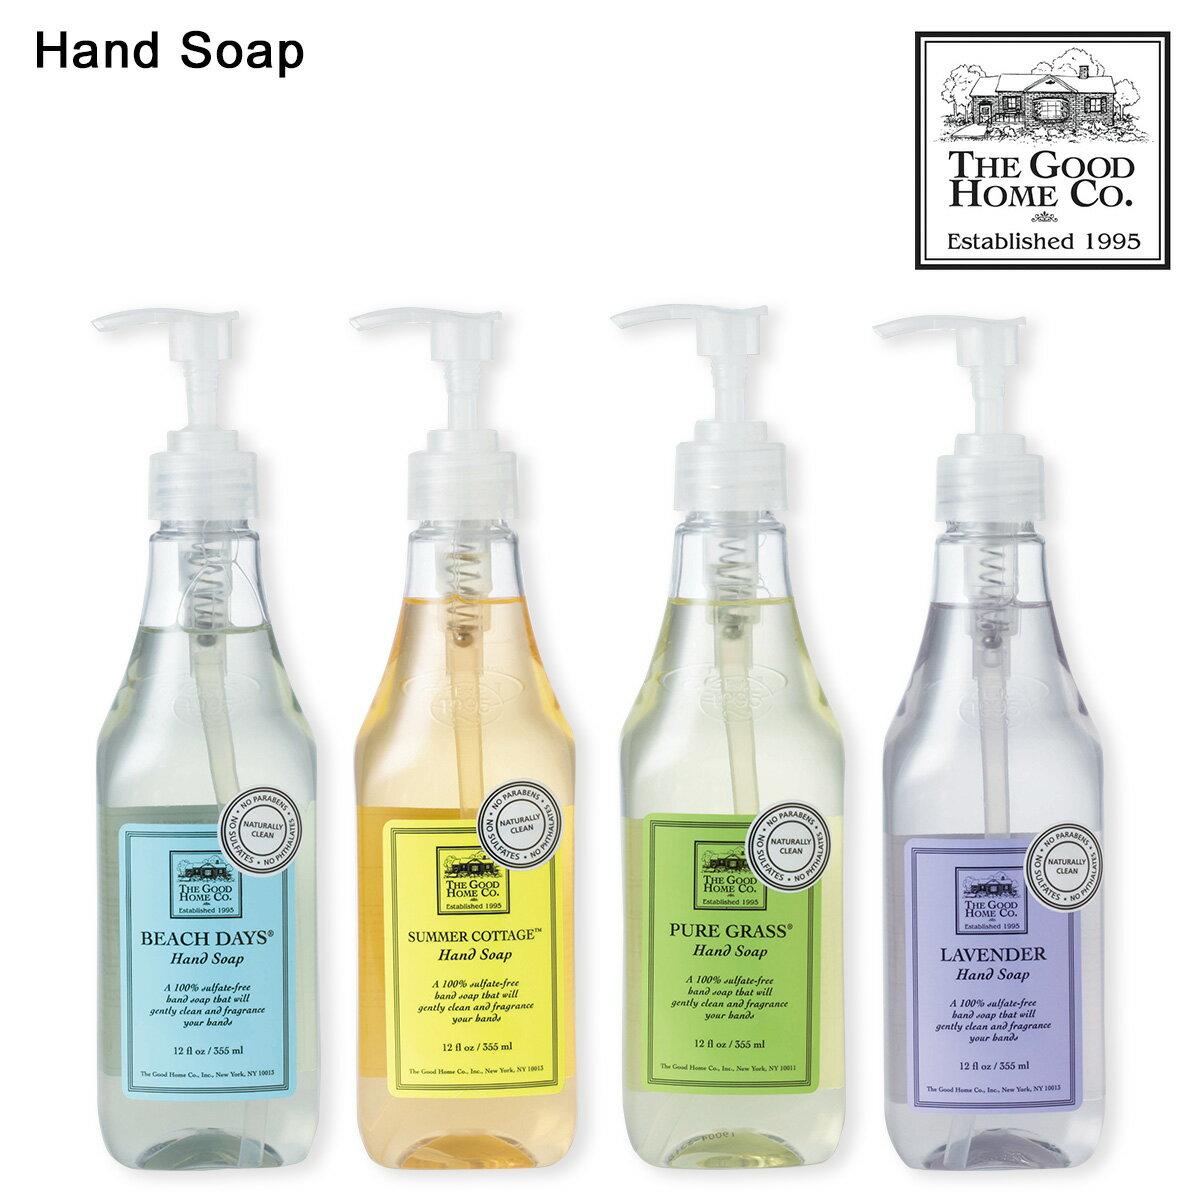 THE GOOD HOME CO HAND SOAP ザ グッドホーム カンパニー ハンドソープ 石鹸 せっけん ギフト 355ml [6/20 新入荷] 【海外発送不可】